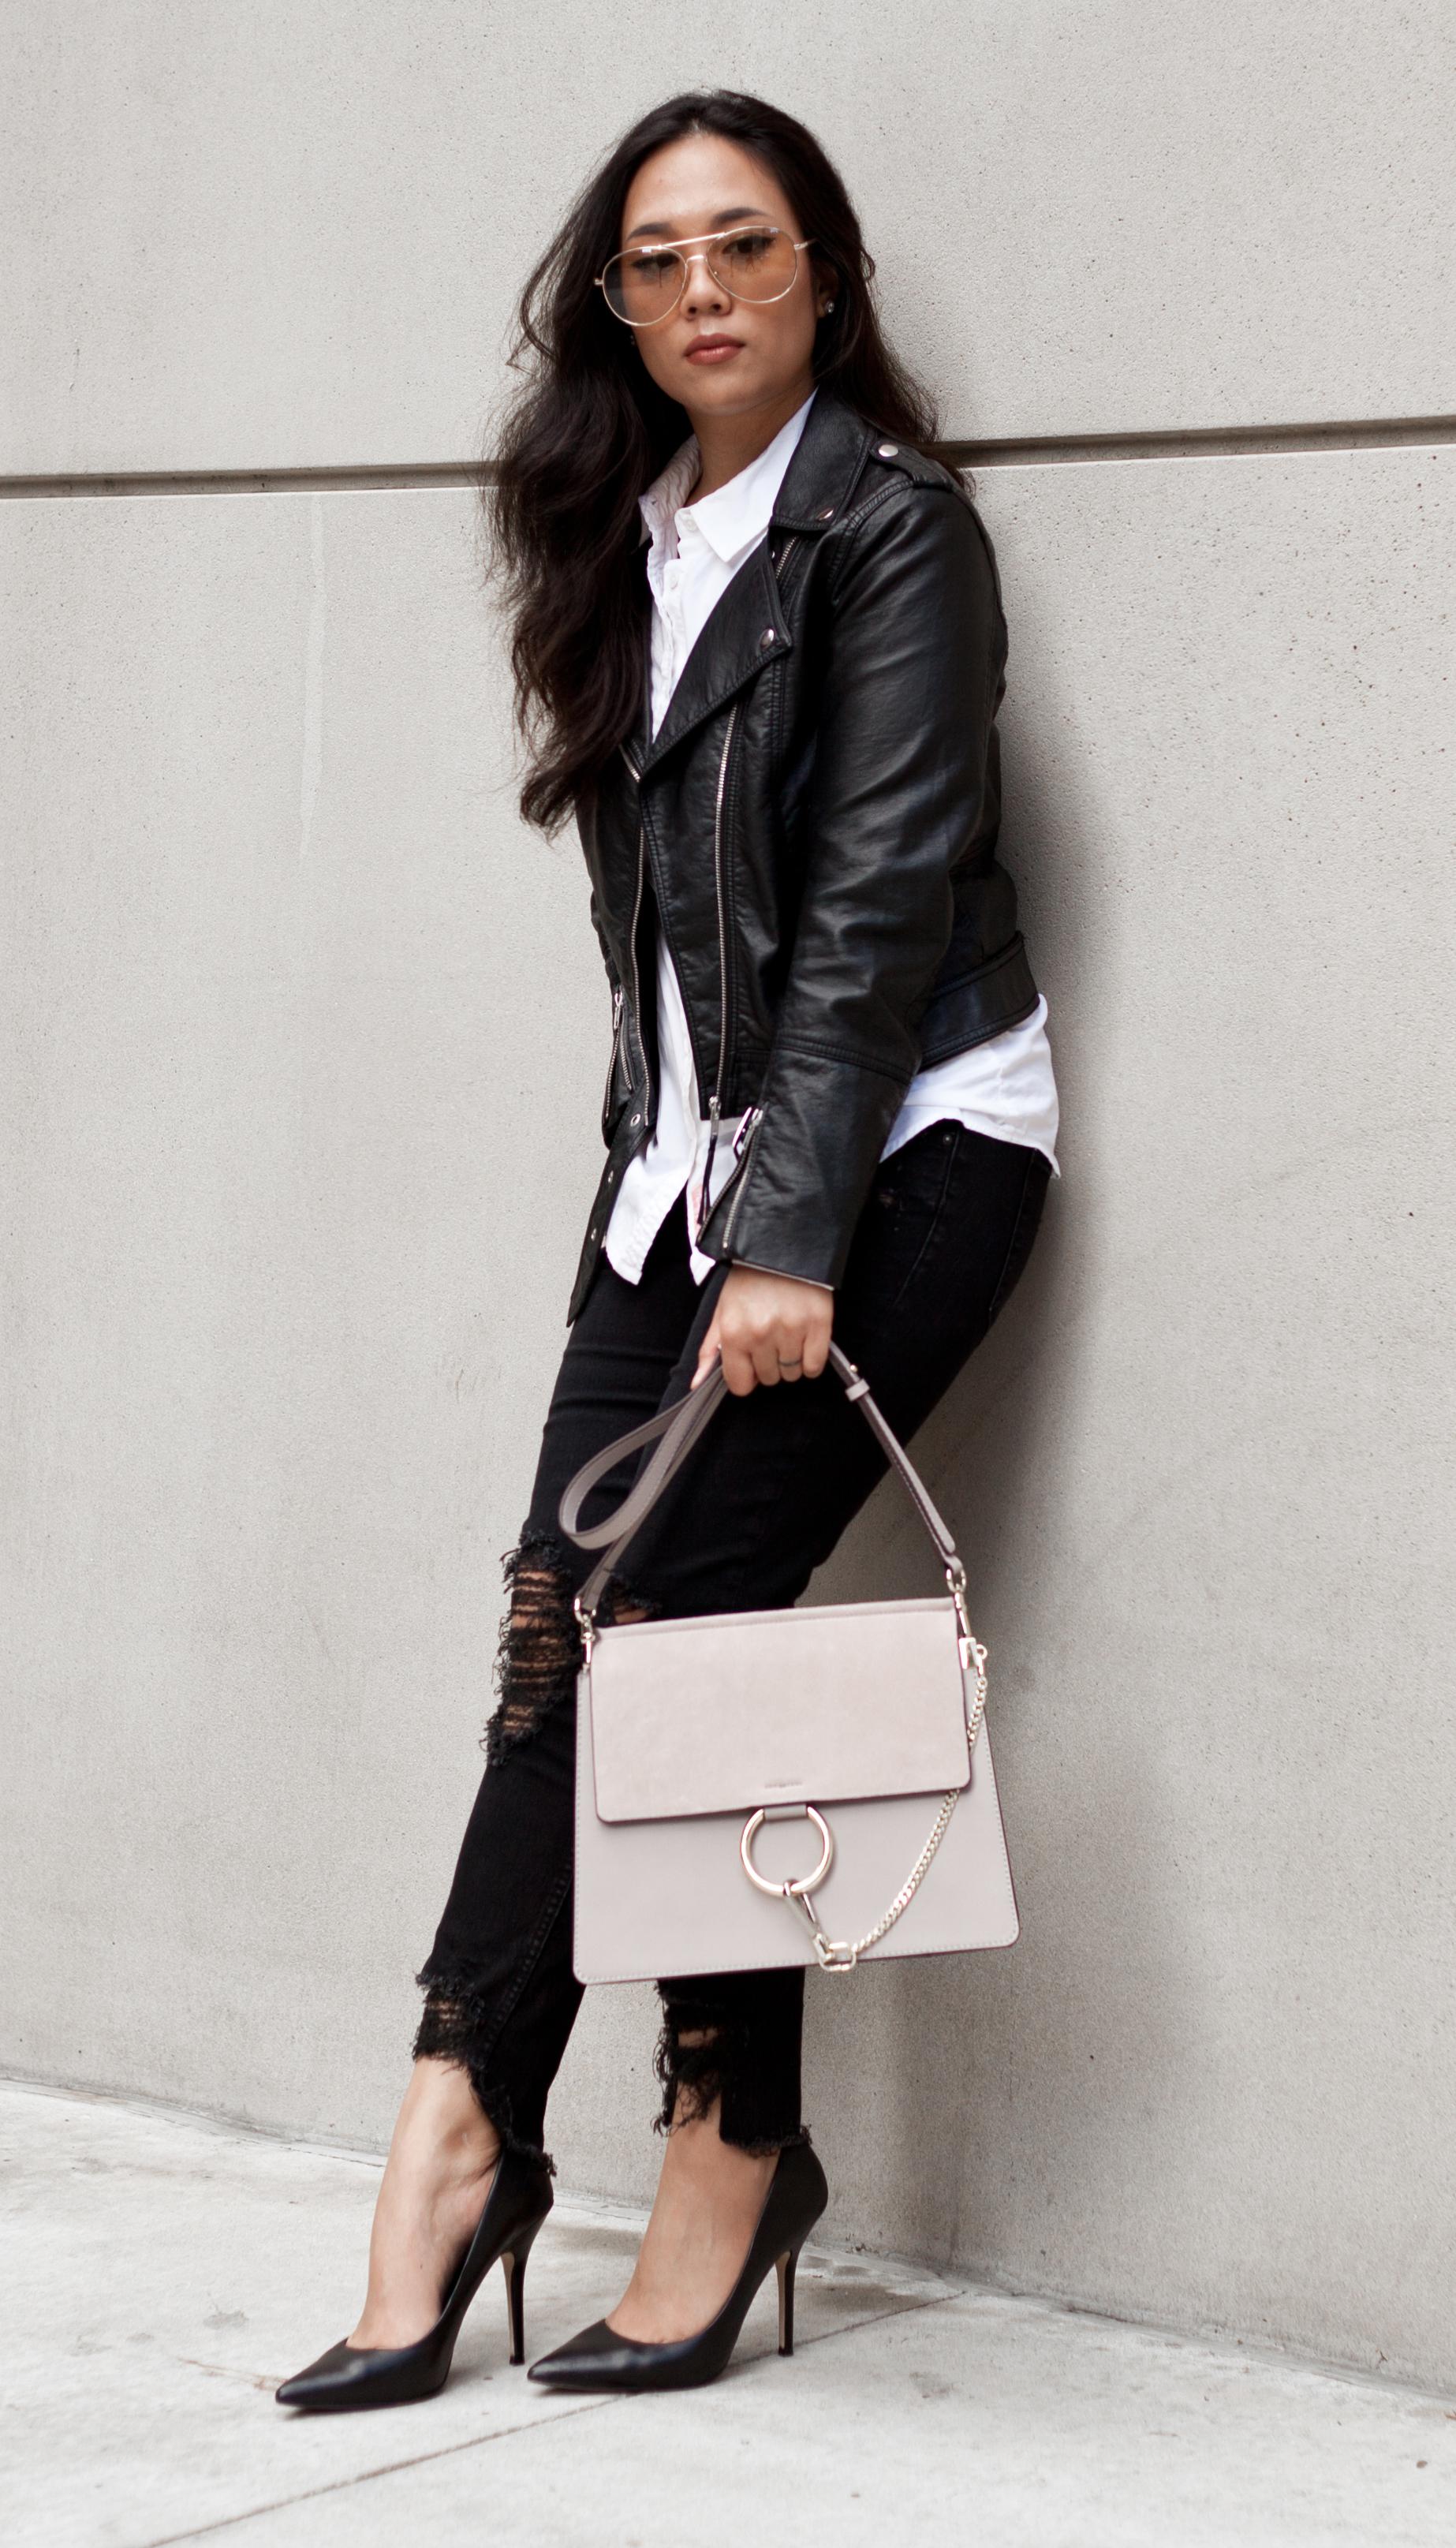 Shop the look- Sunglasses: $9.99, Genuine Leather Handbag: $65.08 (Dupe for Chloe's $1,950 Faye), Biker Jacket: $29.99, Shirt: $19.90, Jeans: $29.90, Heels: $37.00 - www.theballeronabudget.com